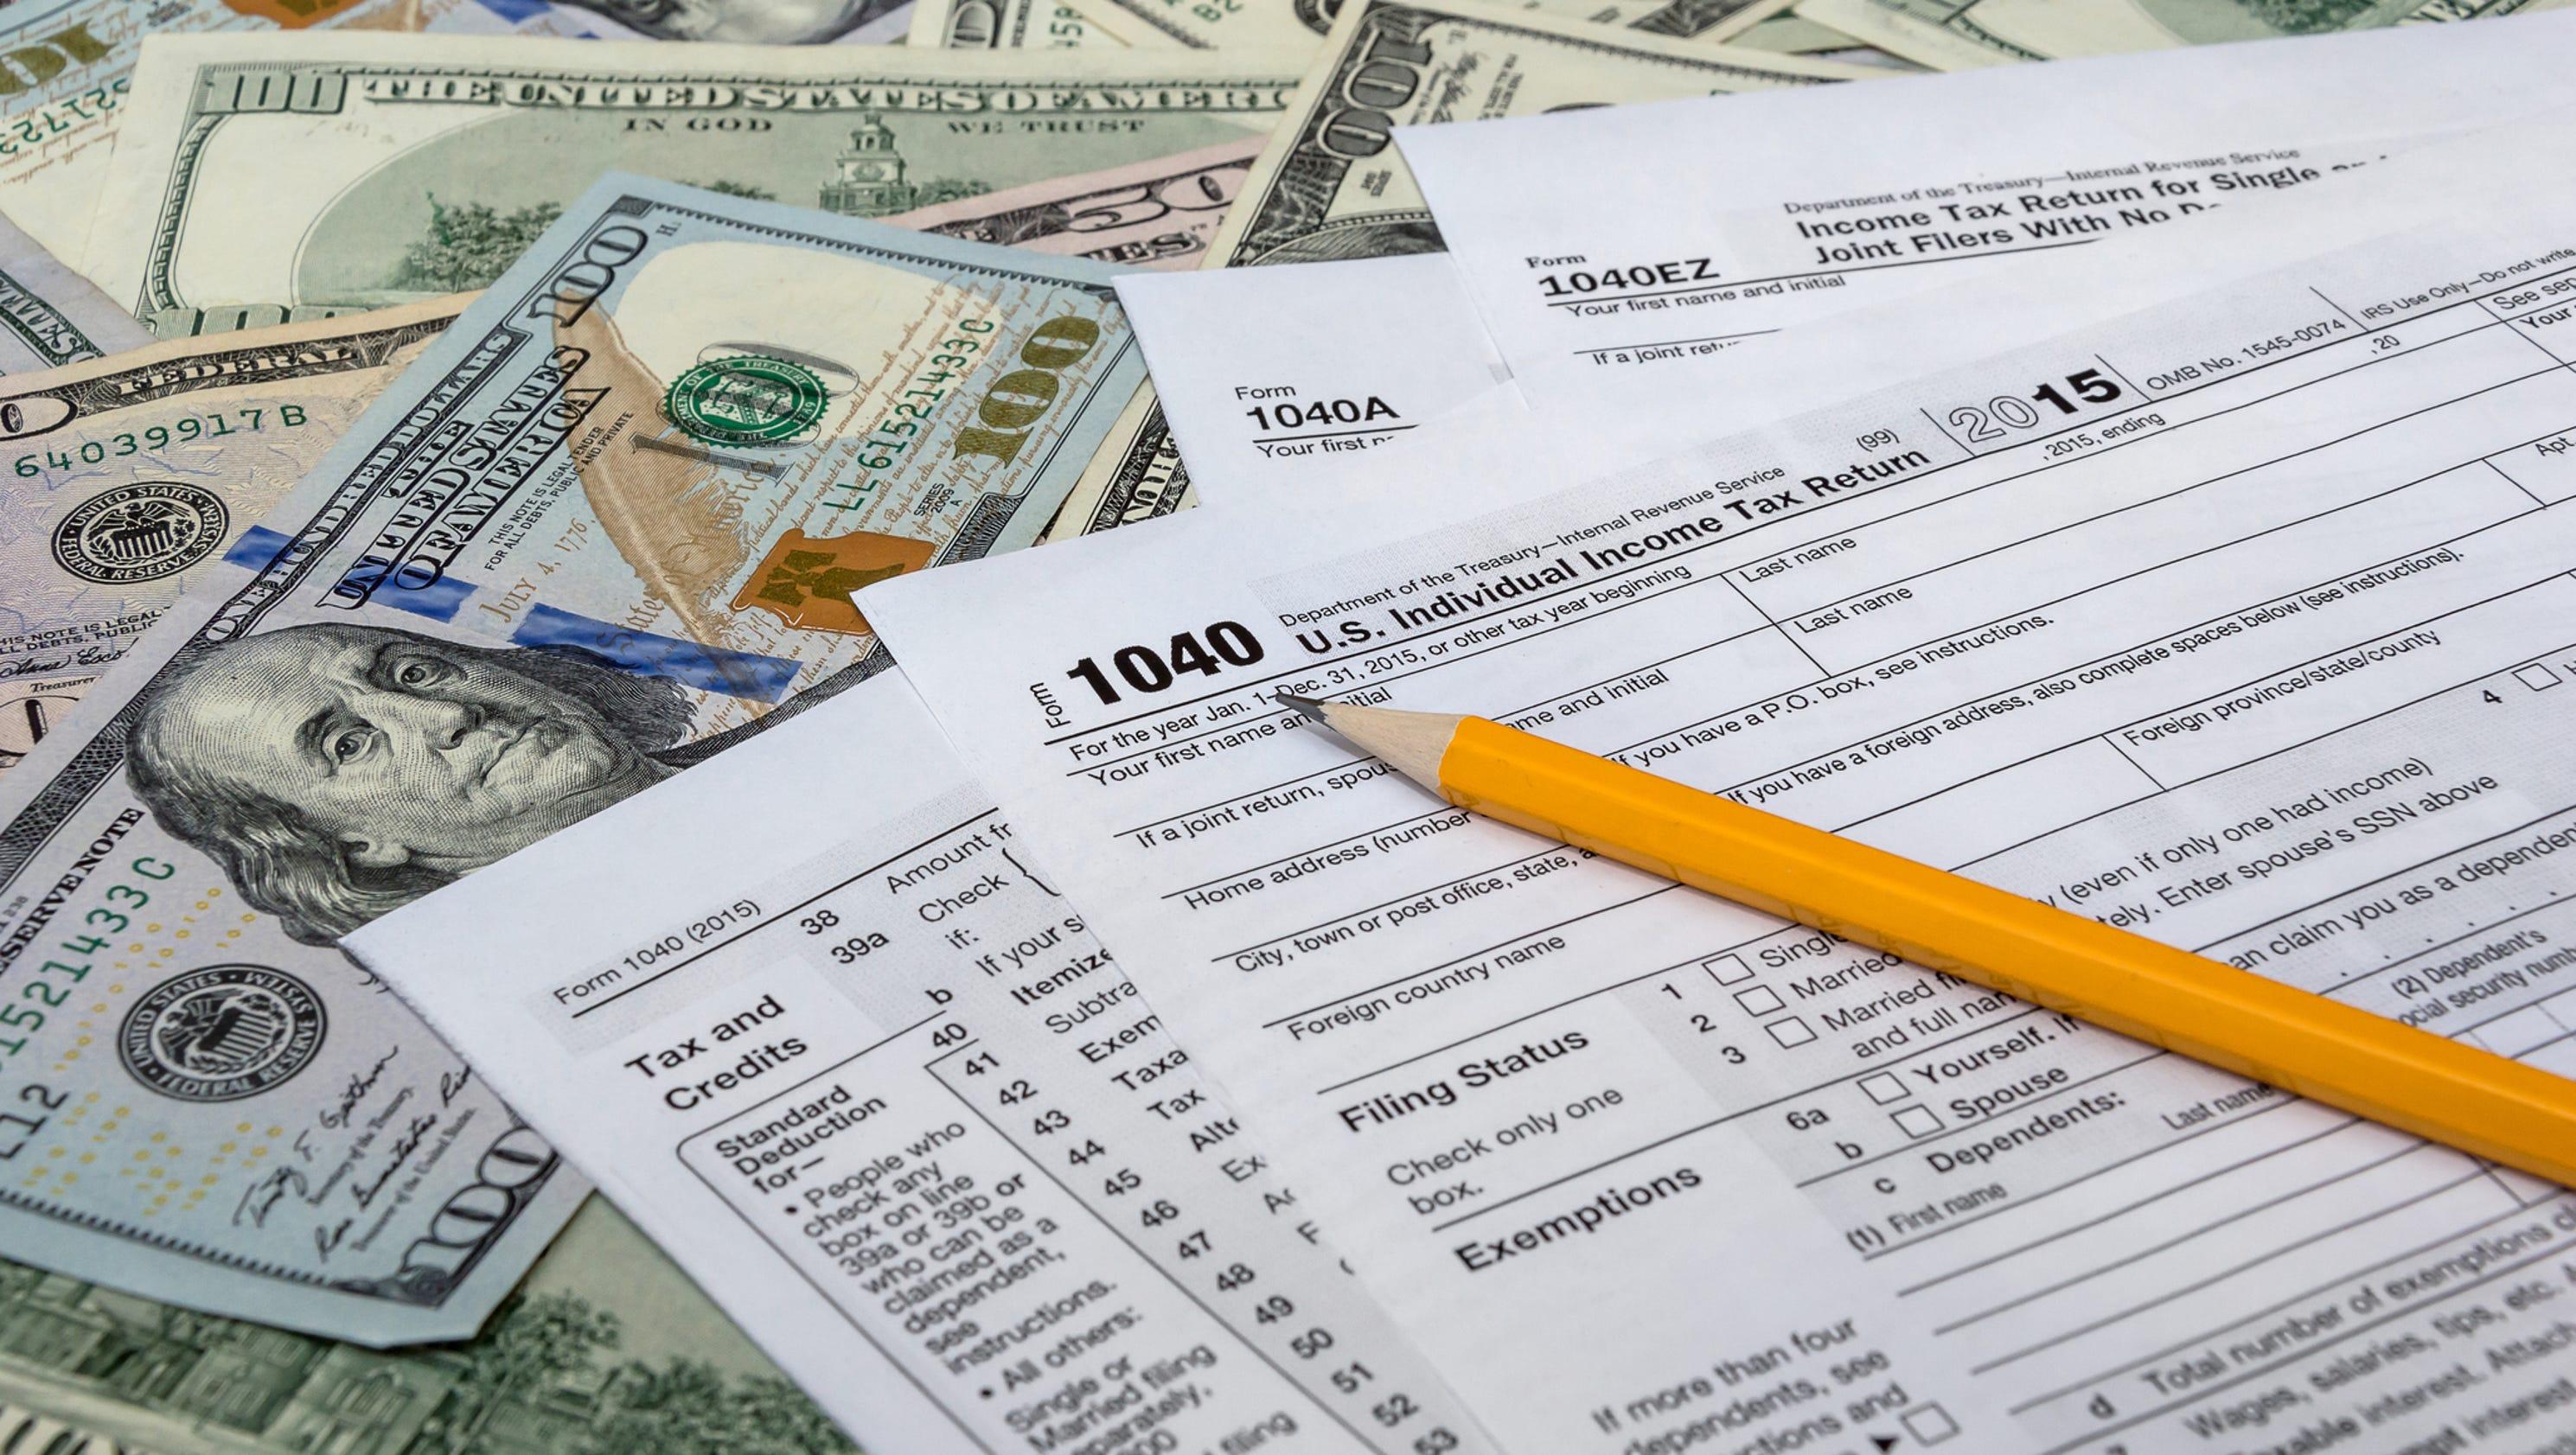 Tax season 3 tax breaks that can cut your tax burden by thousands tax season 3 tax breaks that can cut your tax burden by thousands and boost your refund falaconquin